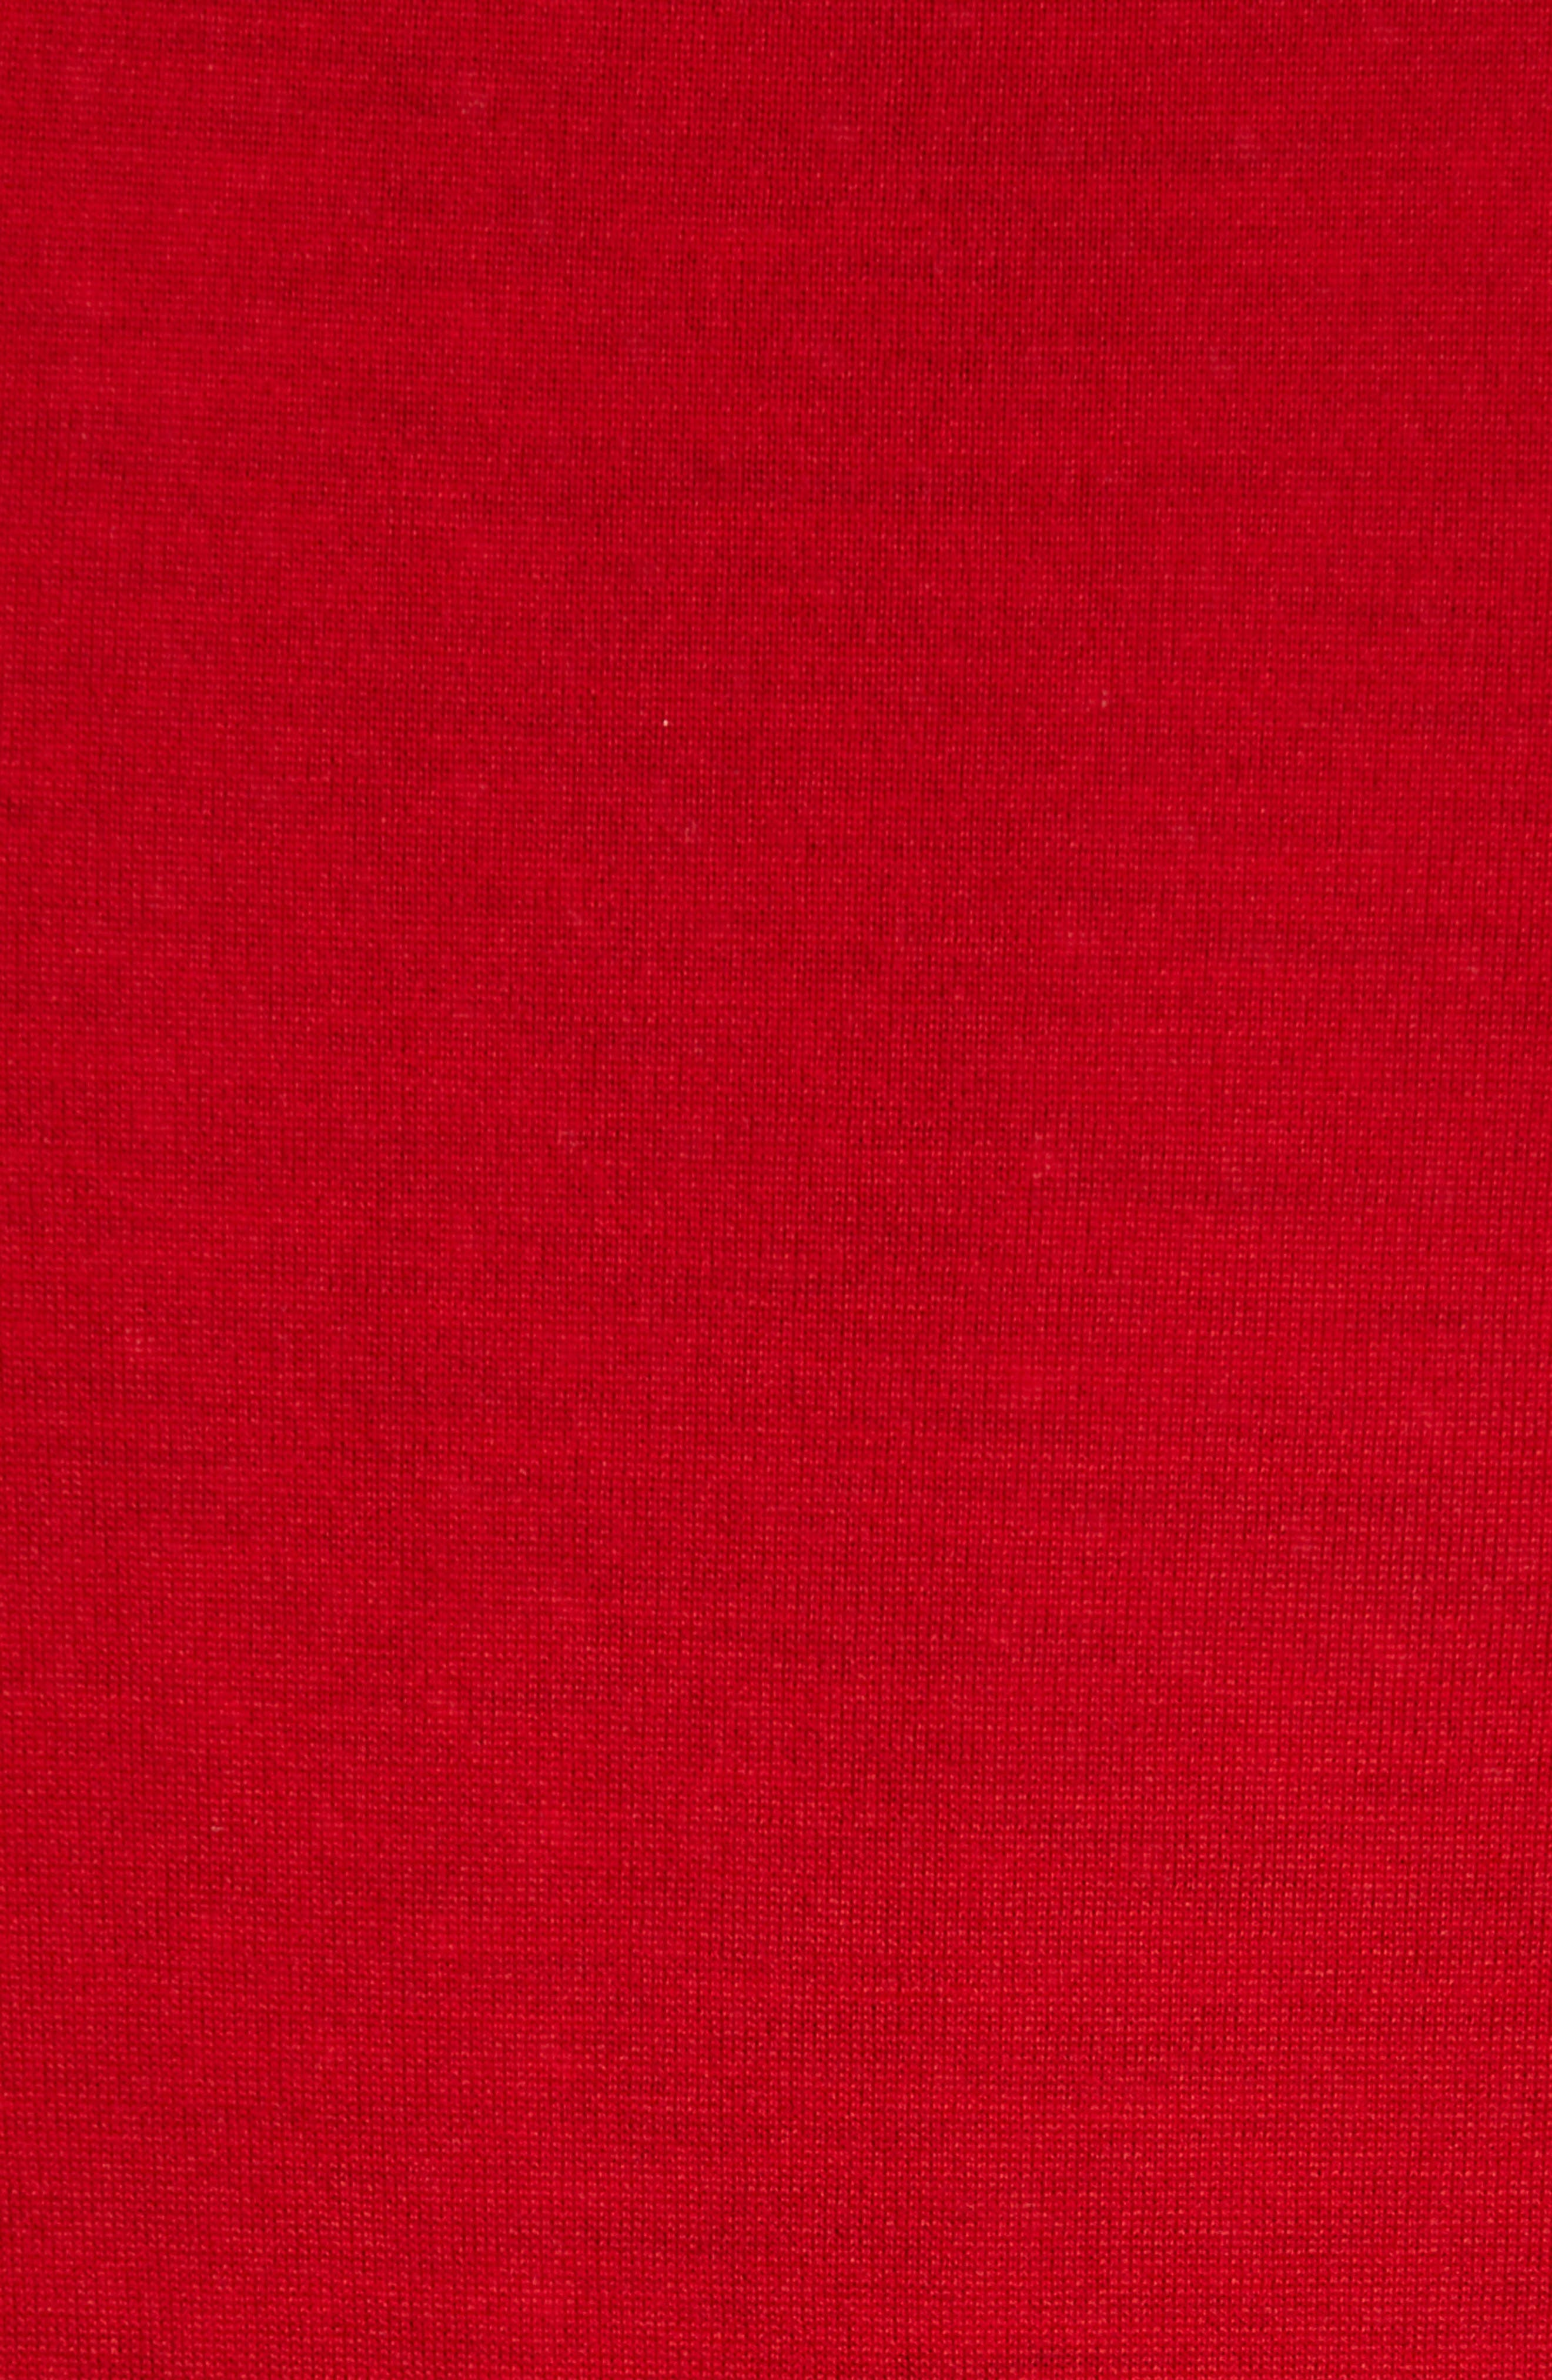 Merino Wool Cardigan,                             Alternate thumbnail 5, color,                             Red